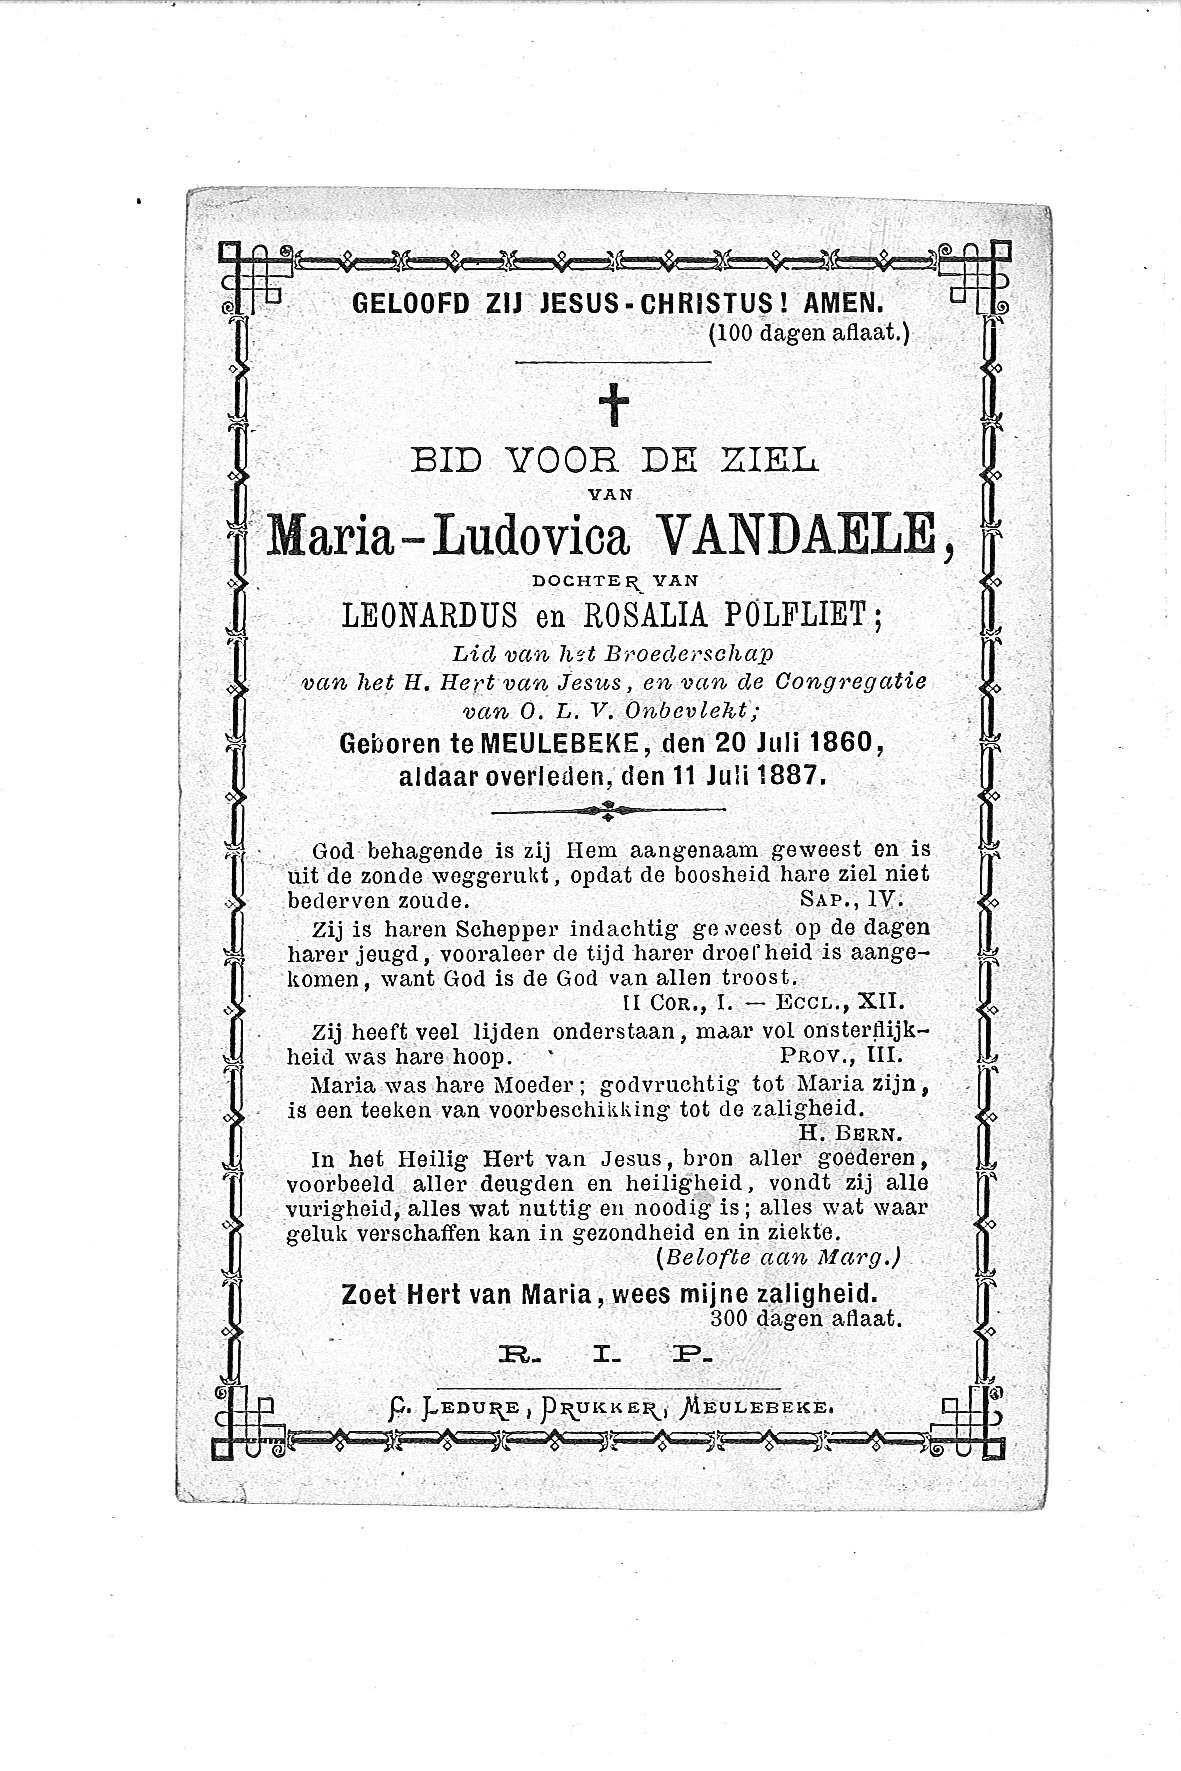 Maria-Ludovica(1887)20091211103320_00003.jpg